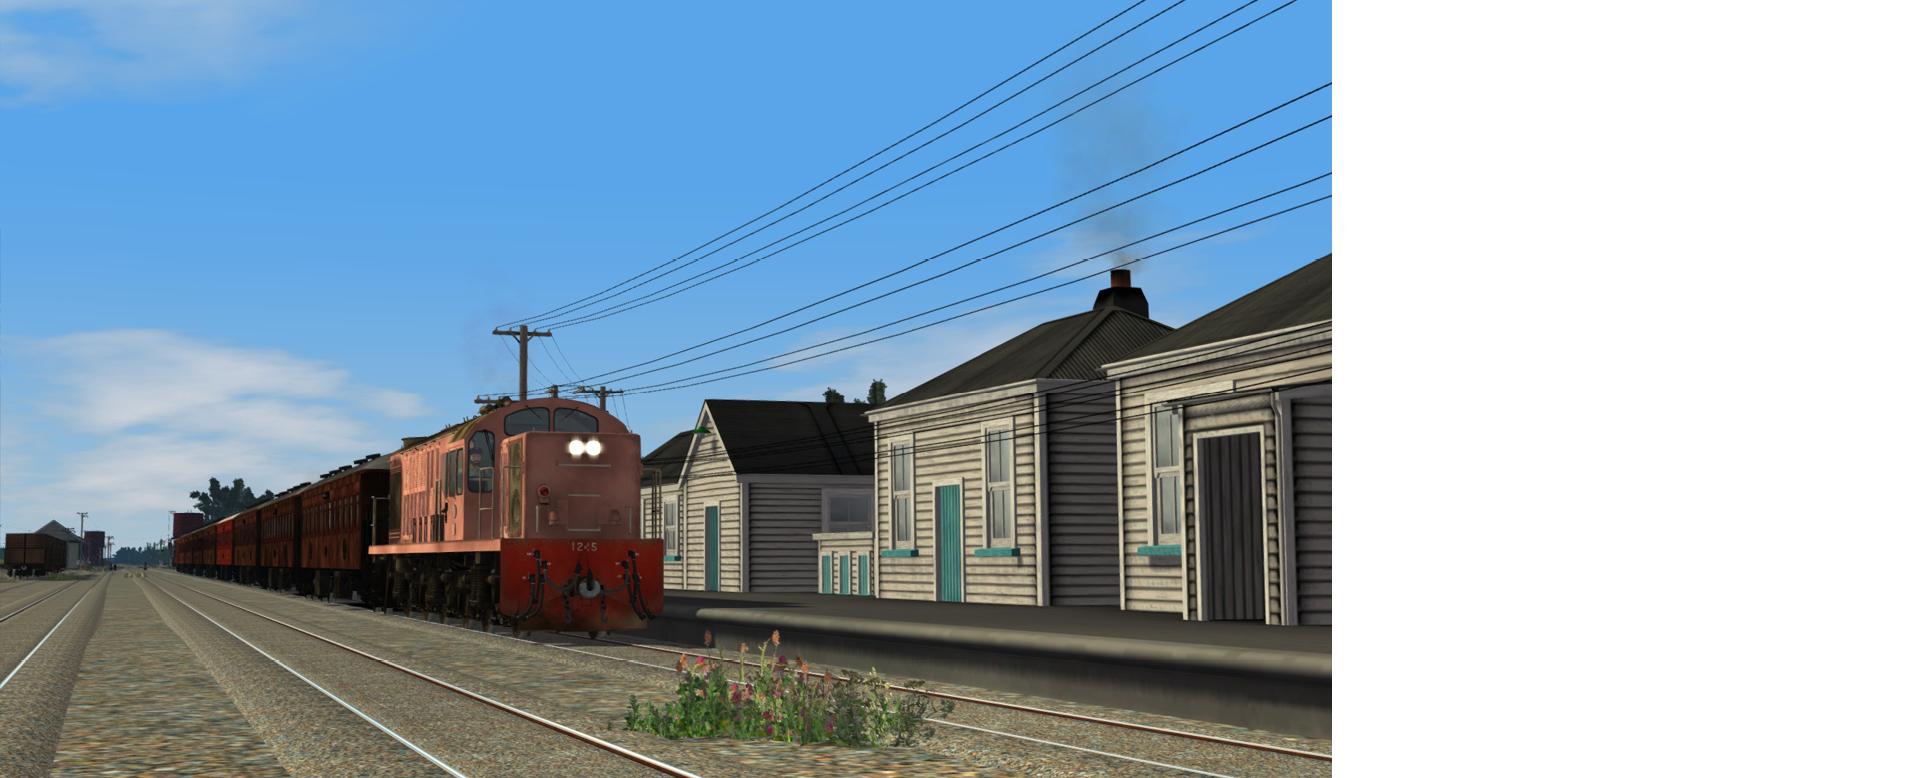 Midland Line: Aickens - Springfield